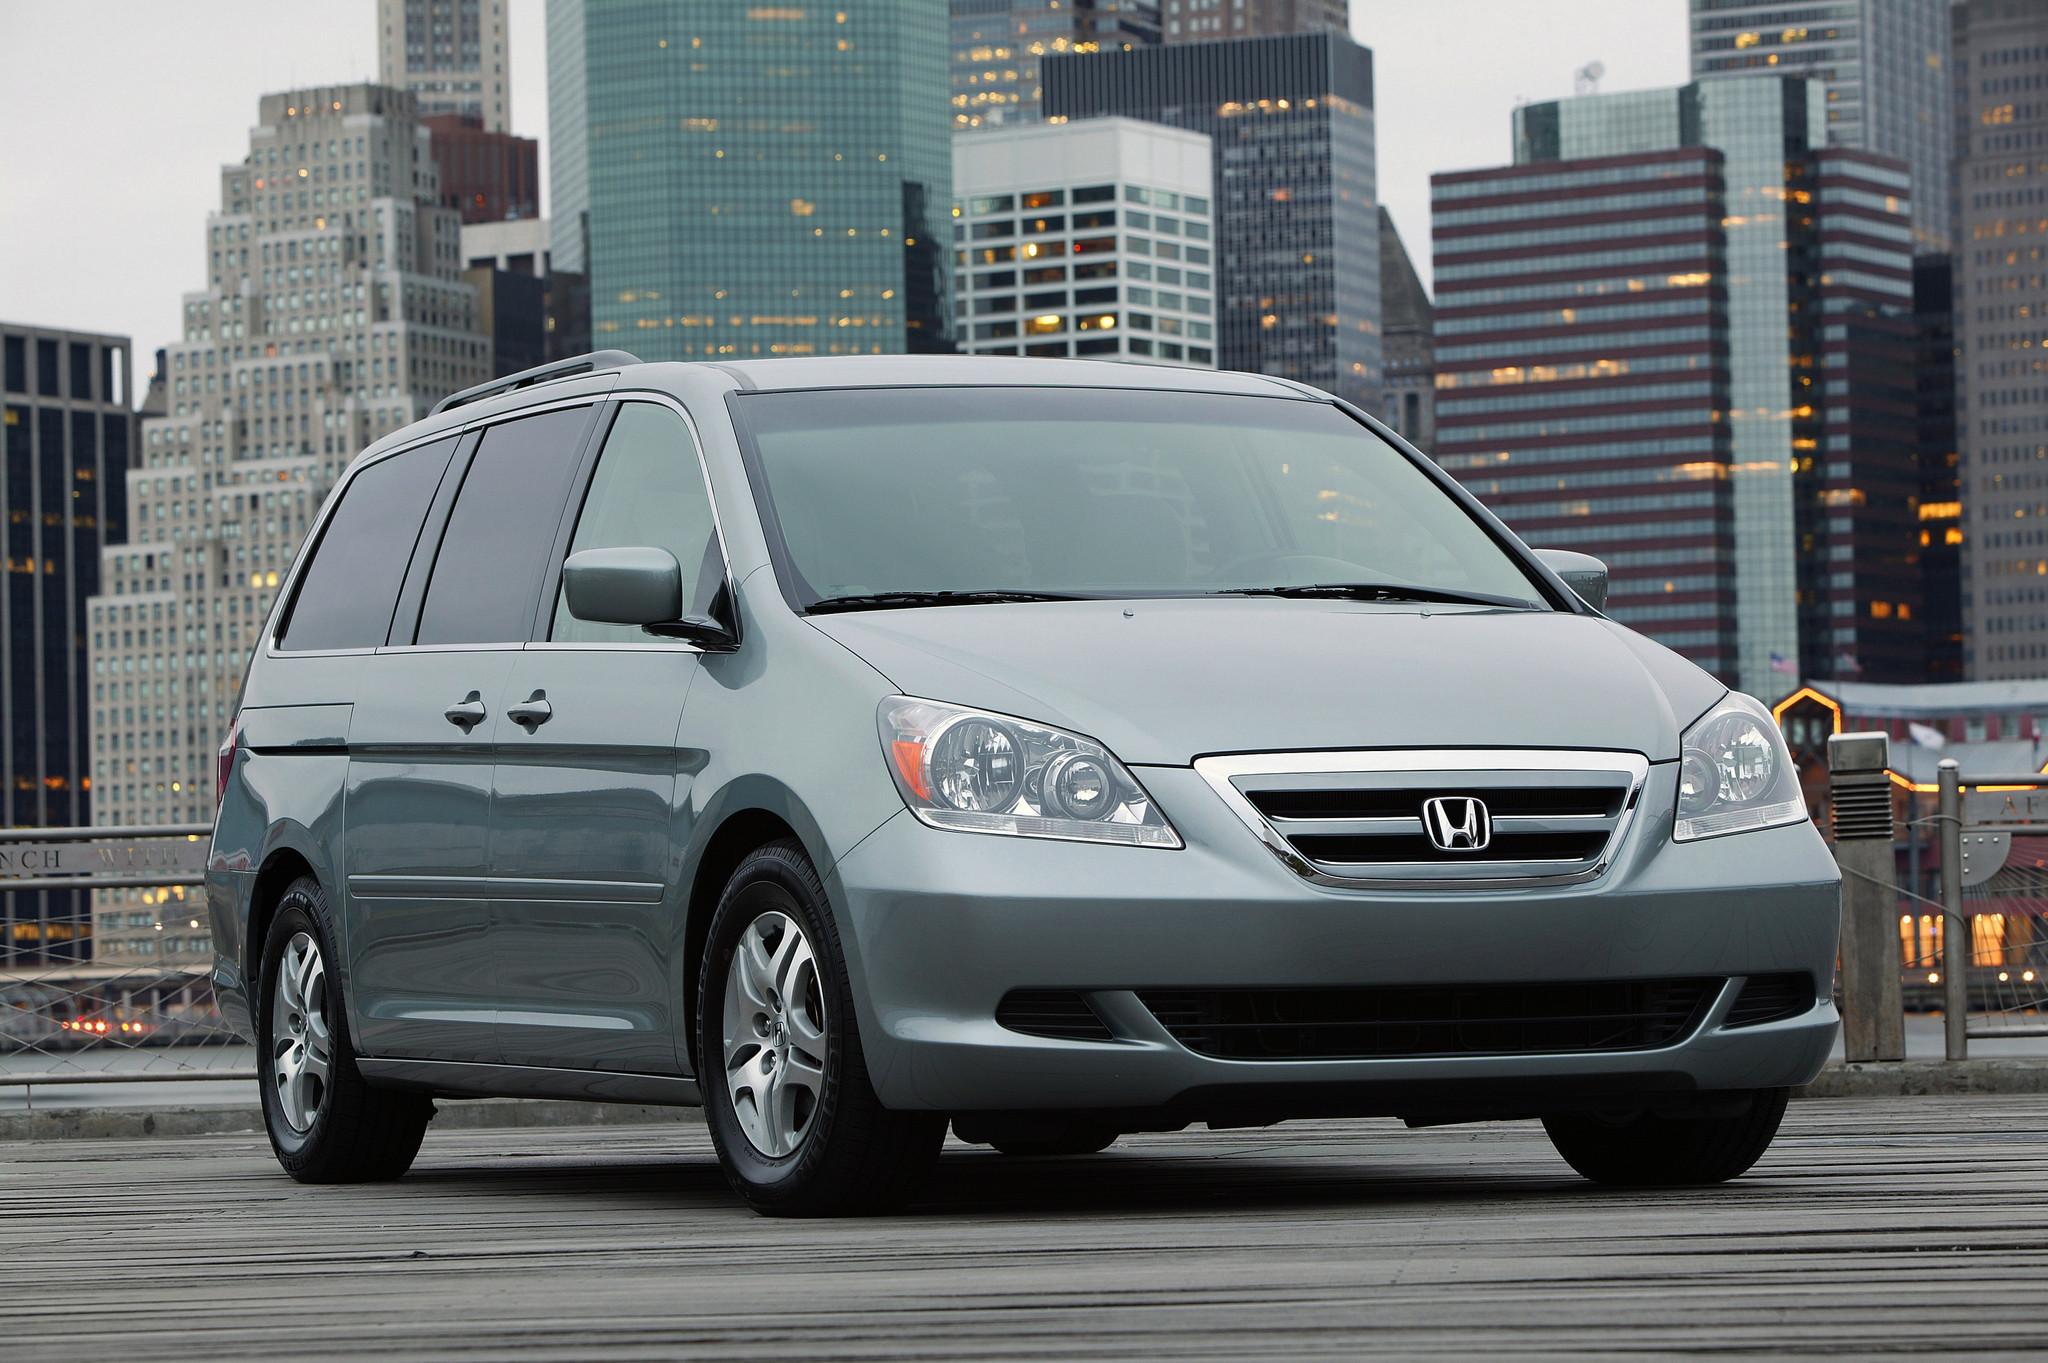 honda recalling 900 000 odyssey minivans due to fire risk hartford courant. Black Bedroom Furniture Sets. Home Design Ideas